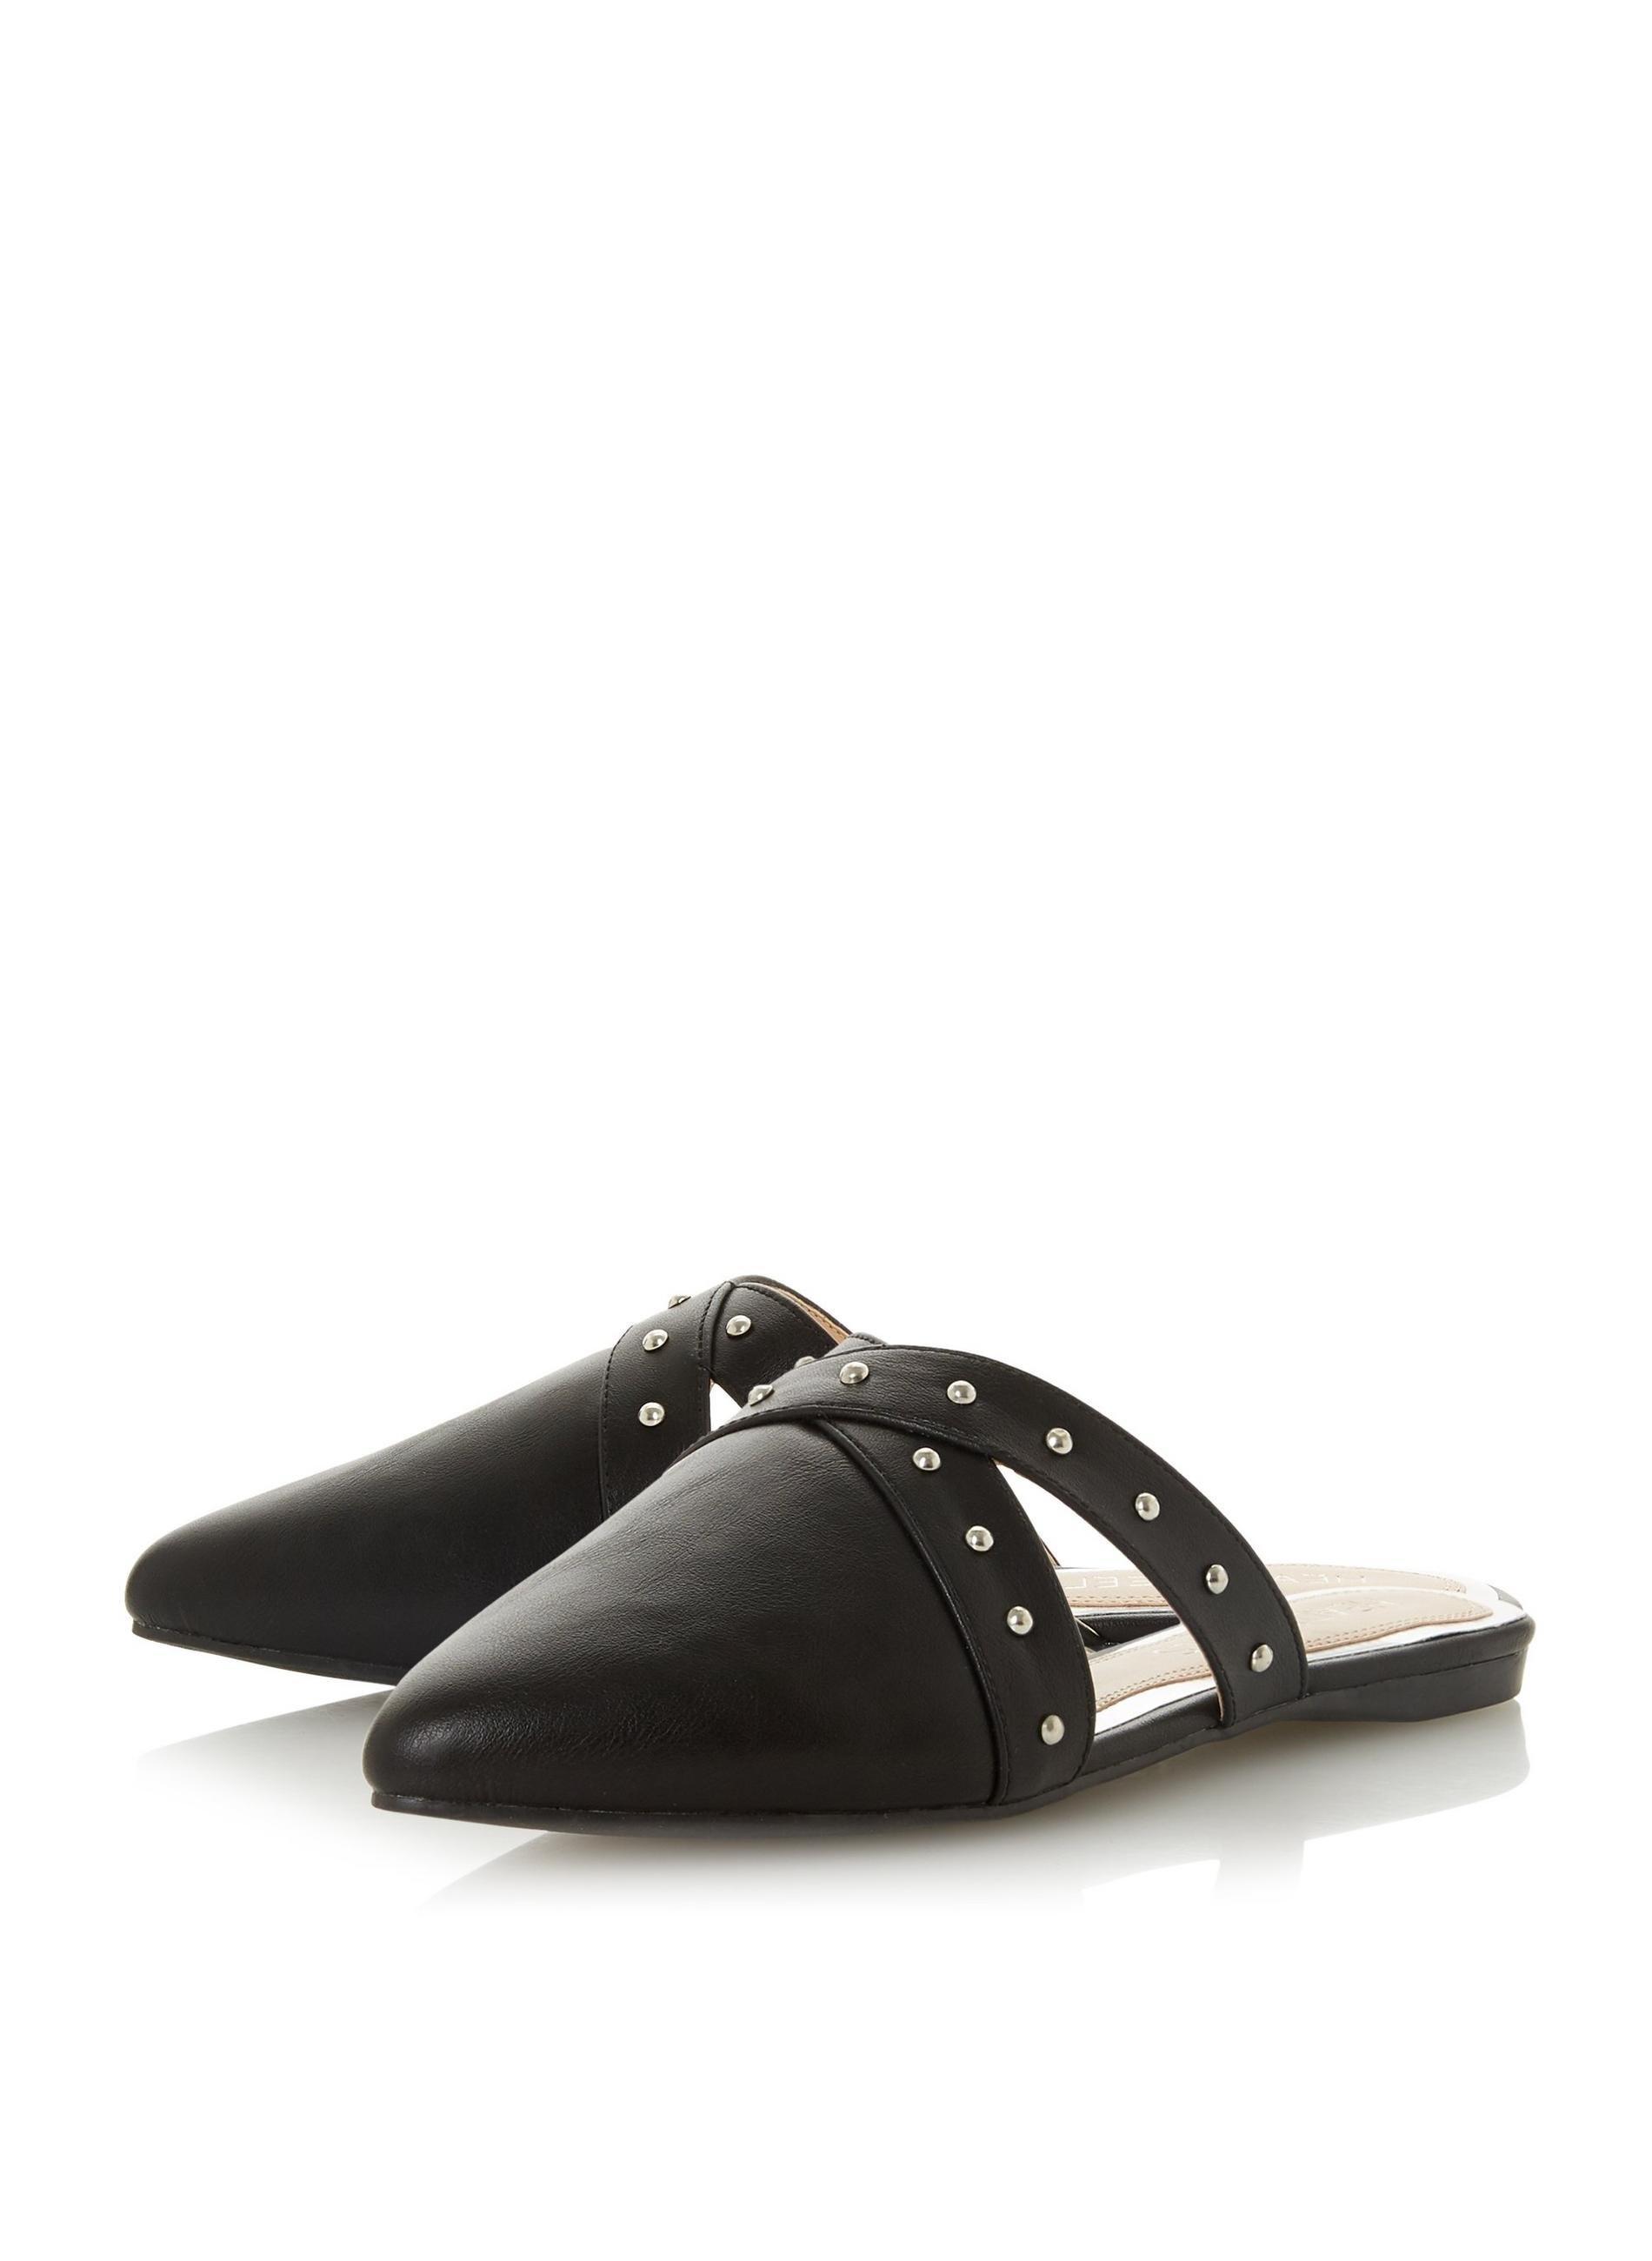 2094c0d686c ... Head Over Heels By Dune Black  harria  Ladies Flat Sandals -. View  fullscreen